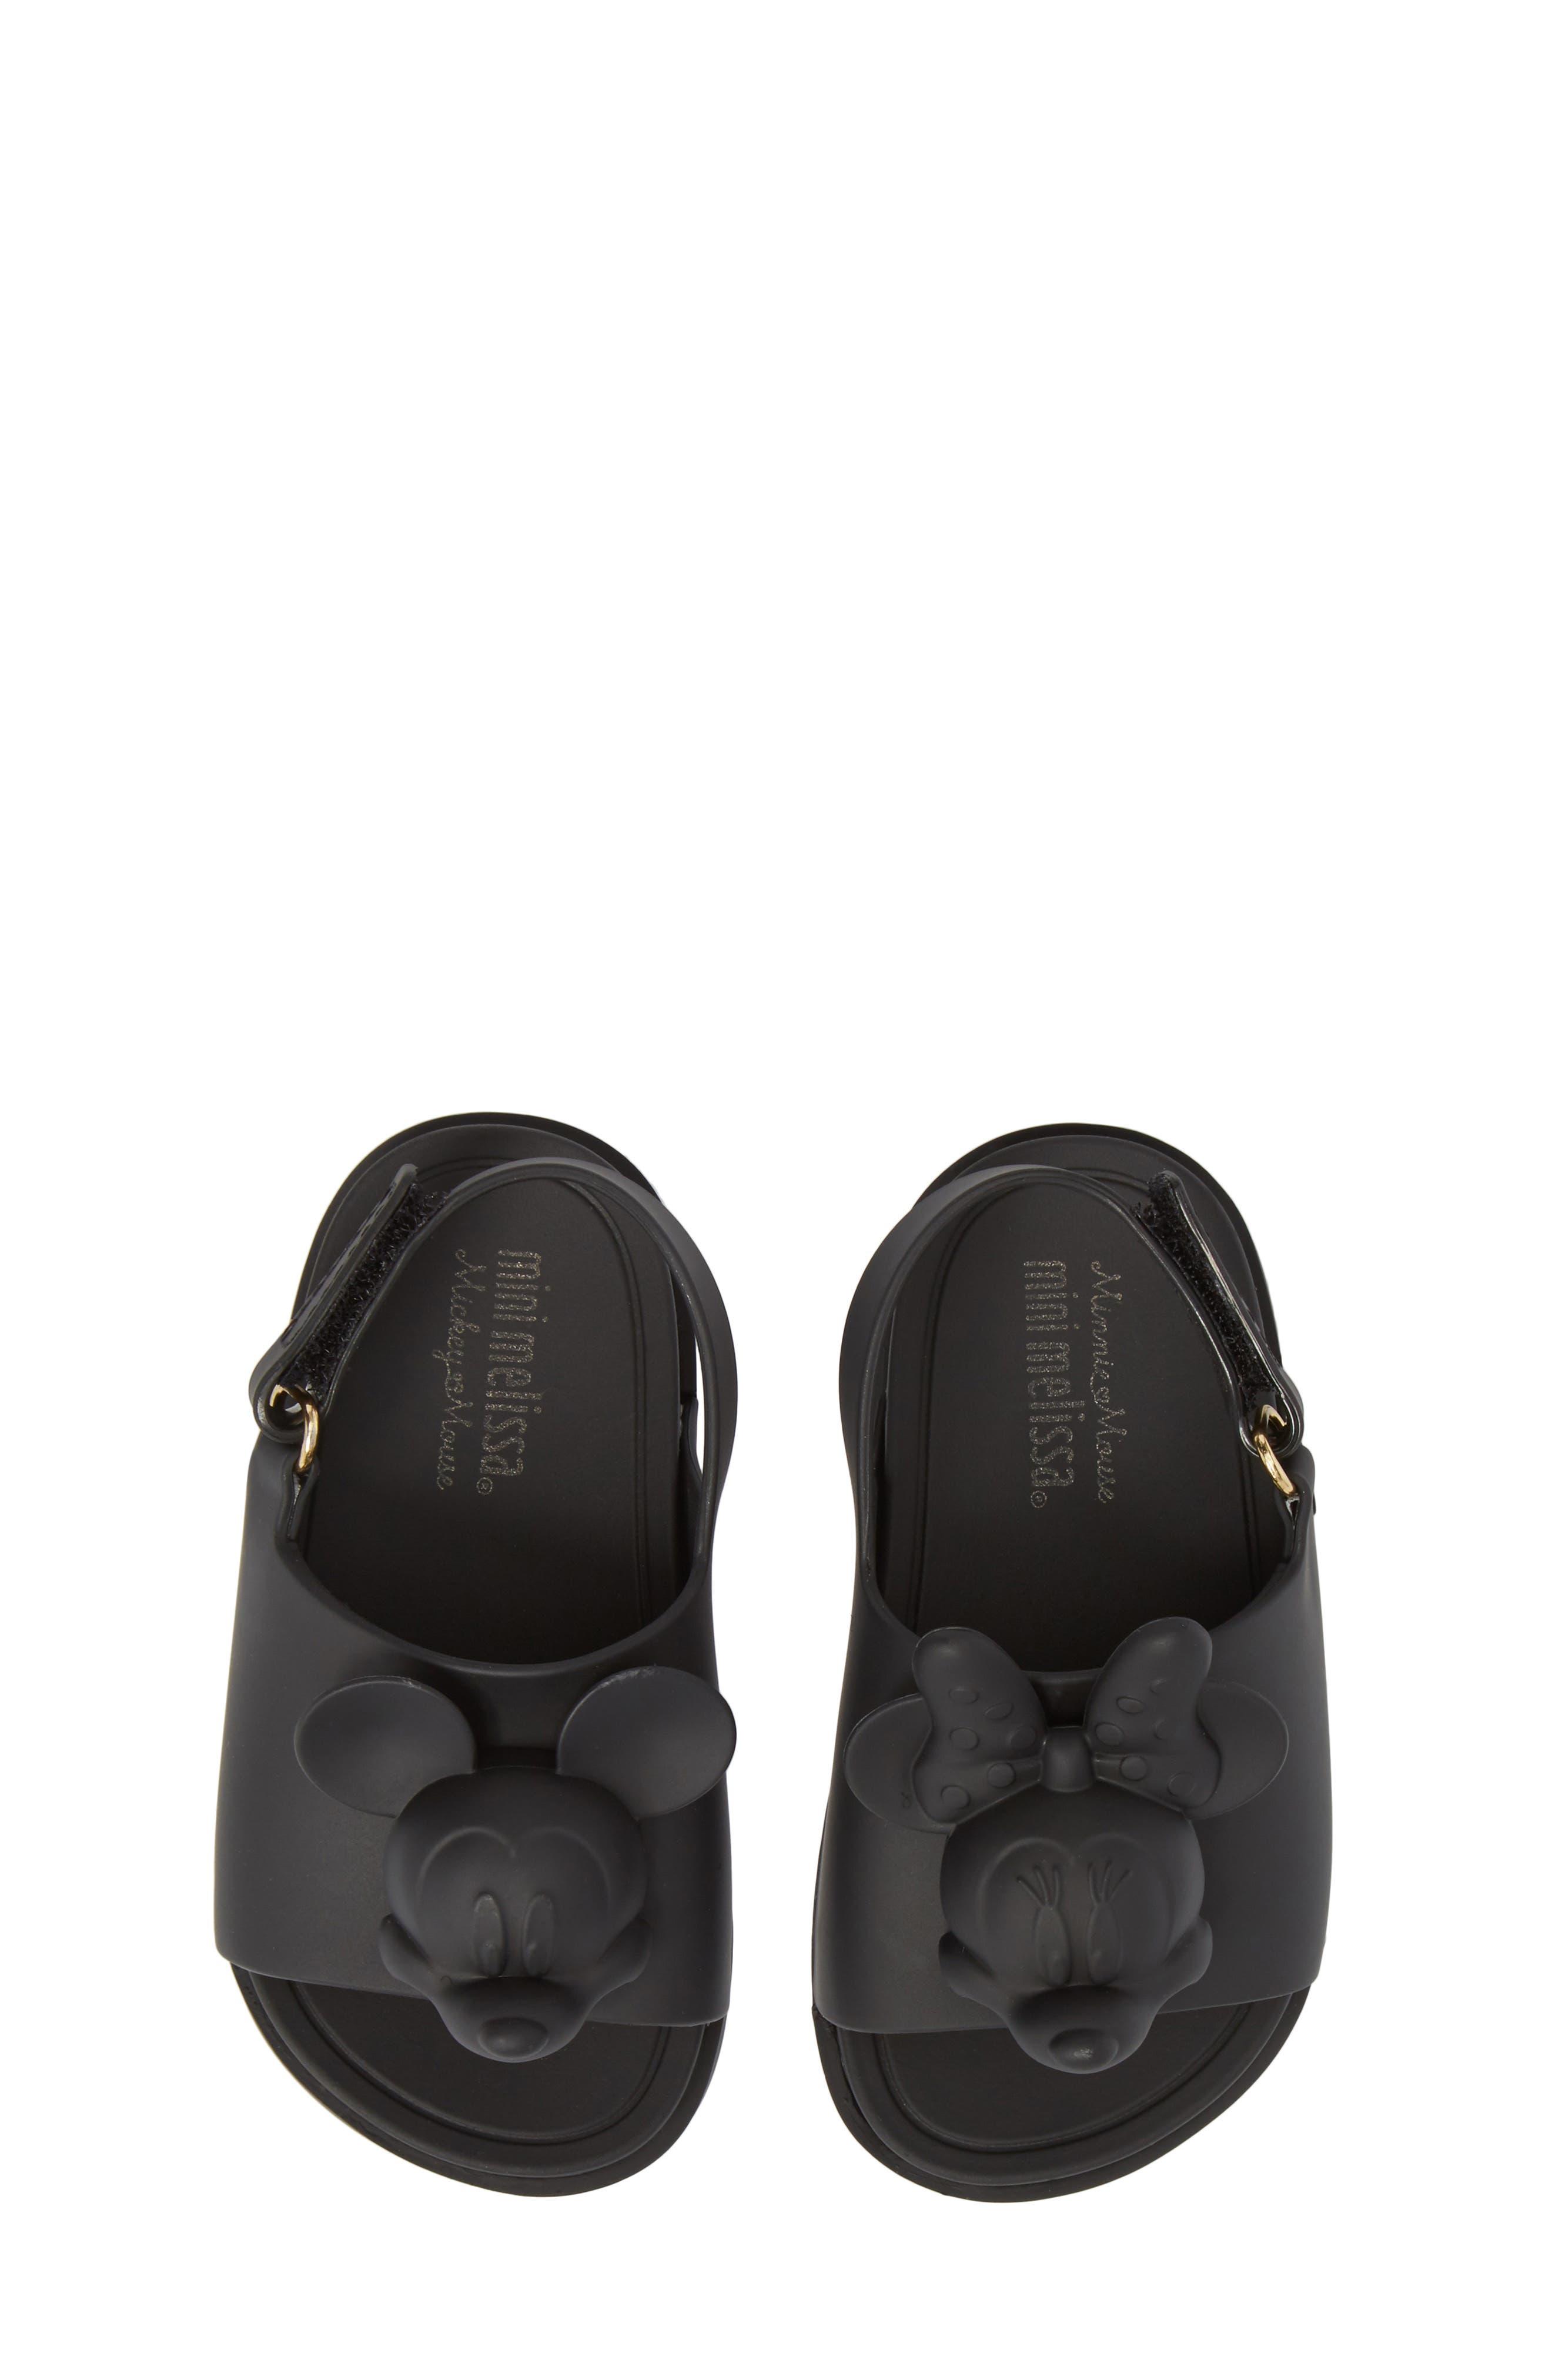 Disney<sup>®</sup> Mini Beach Sandal,                         Main,                         color, 001